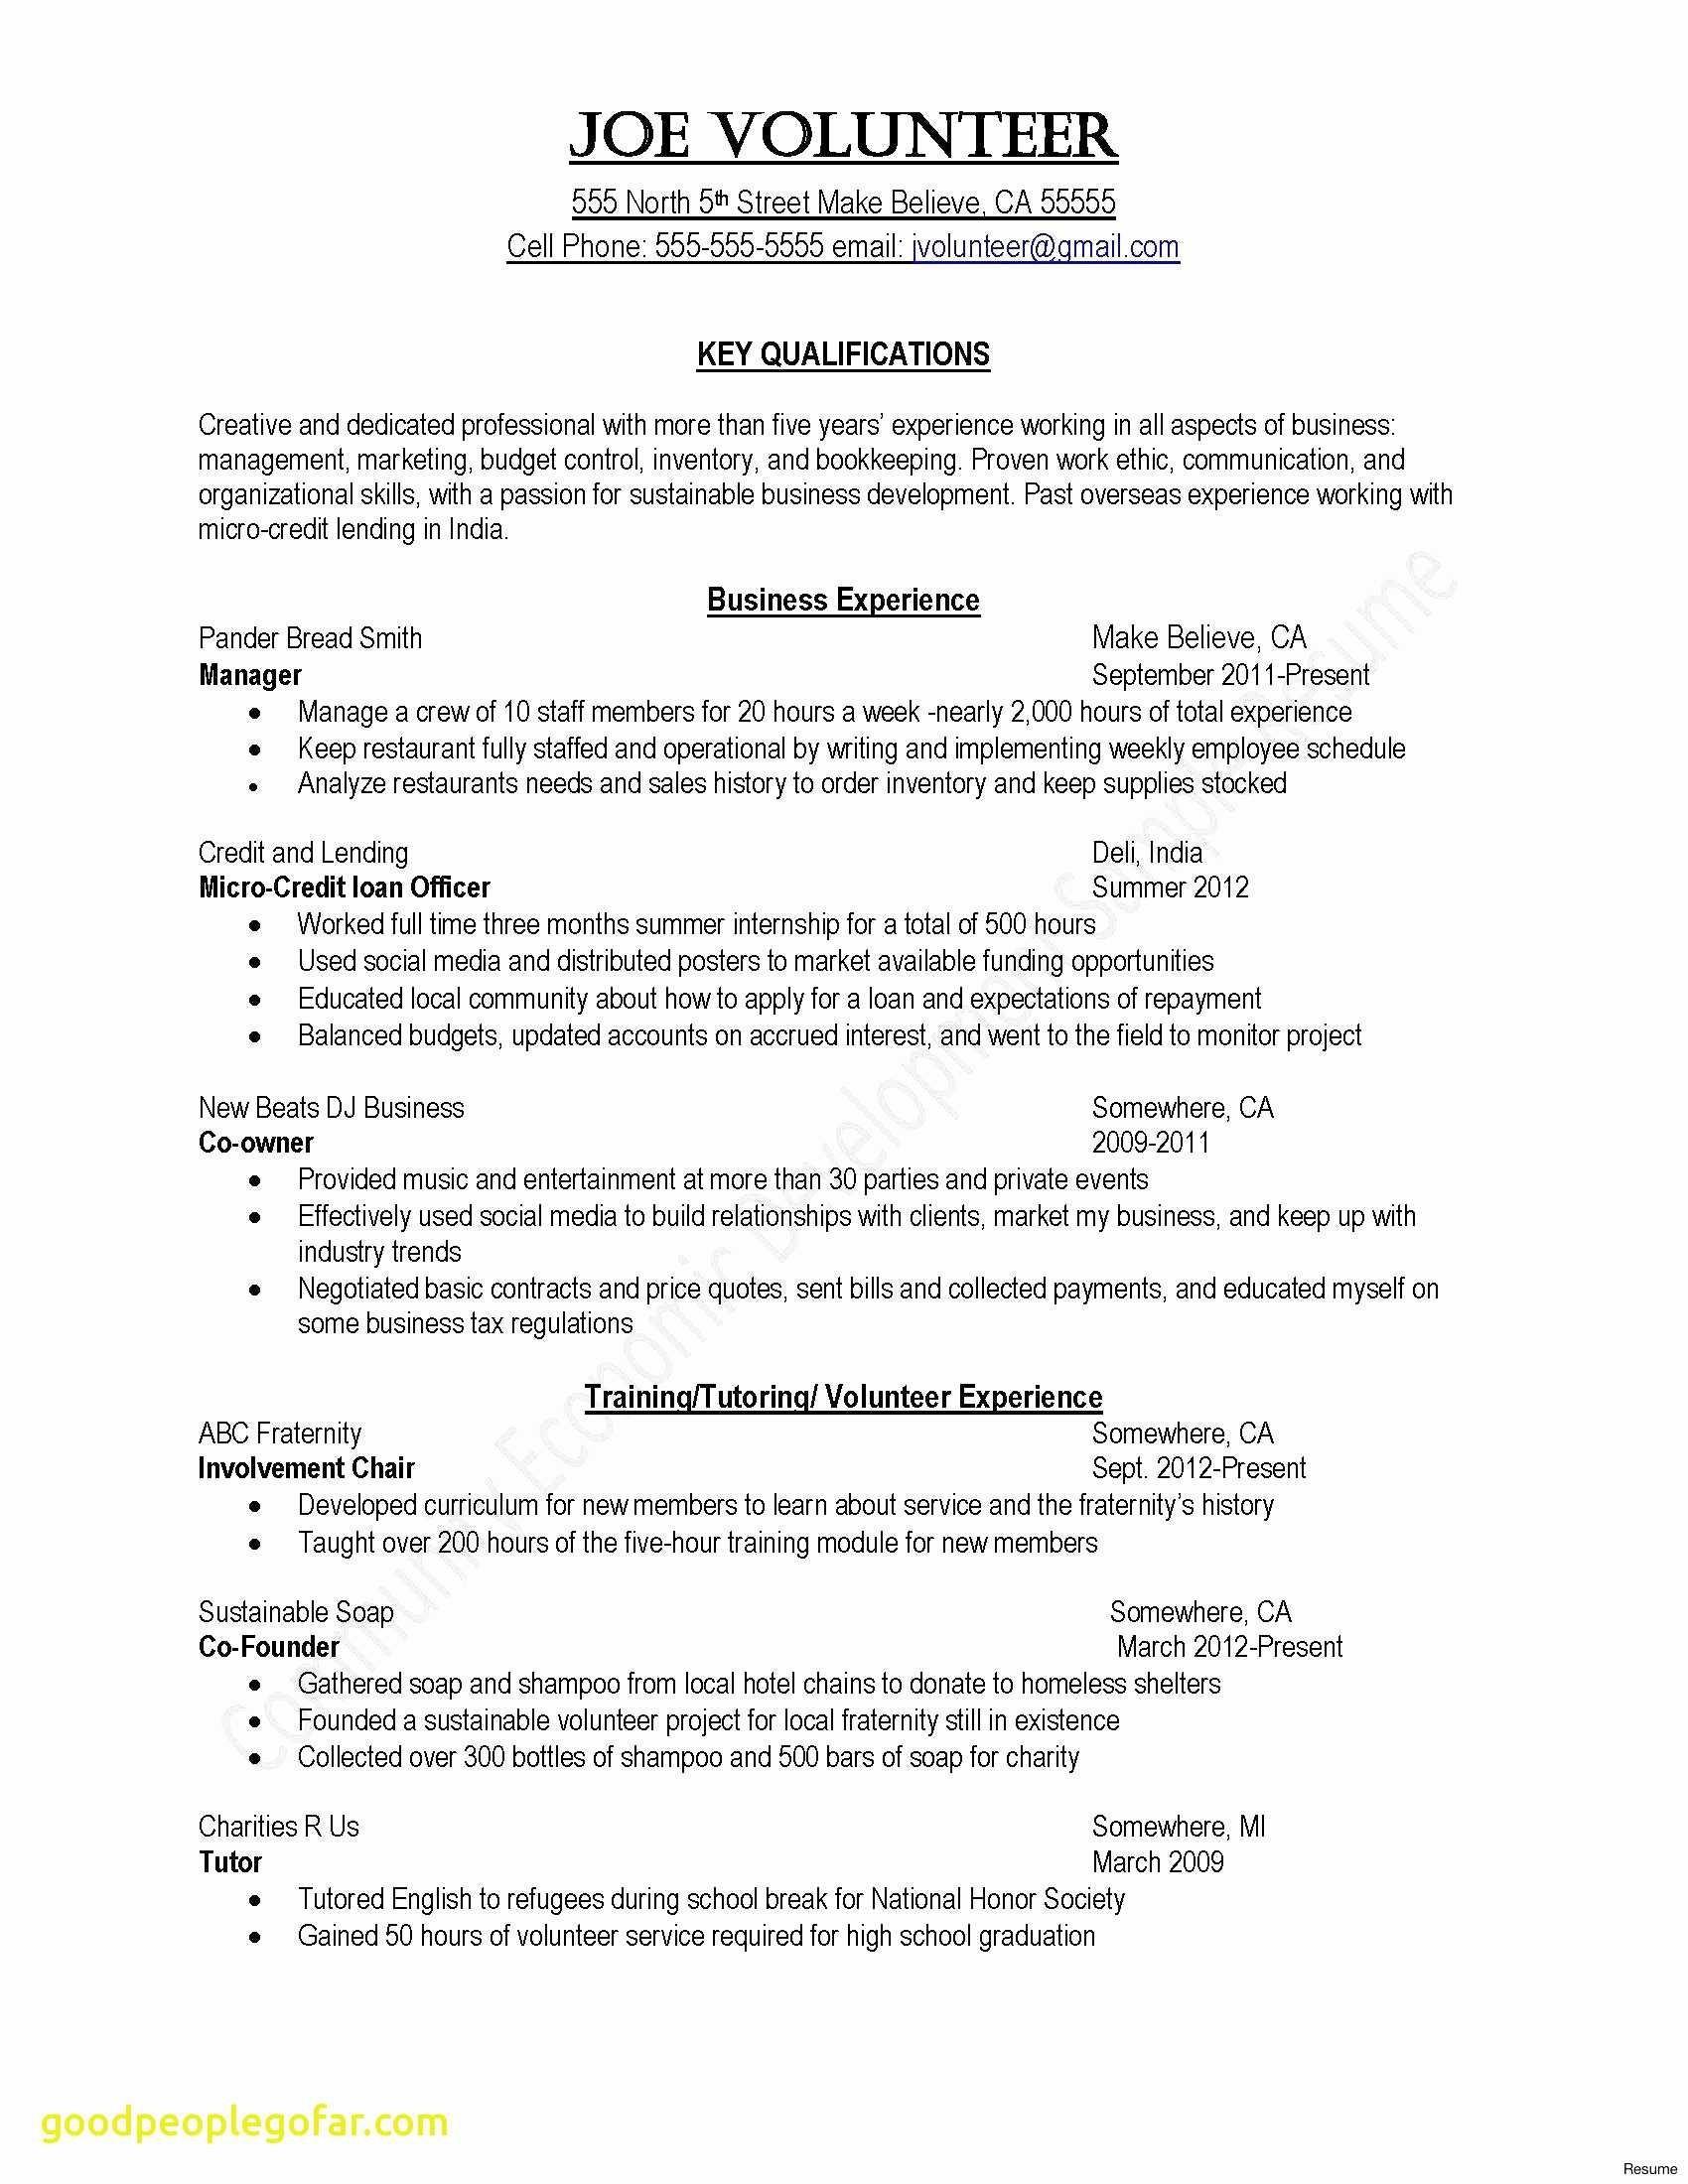 Employment Verification Letter Free Template - Sample Job Verification Letter Valid Best Sample College